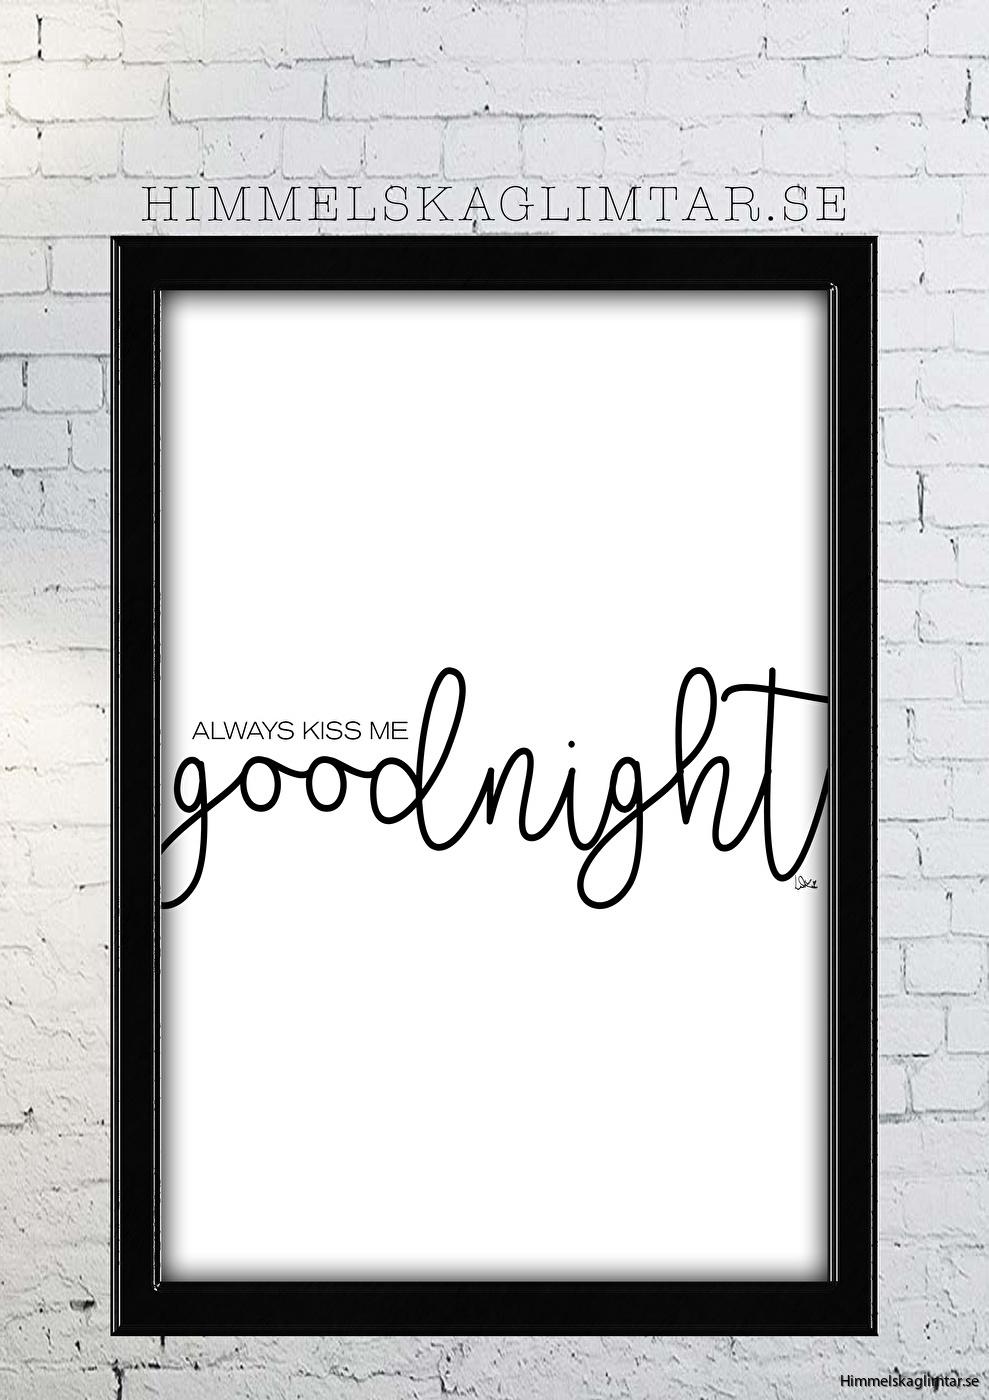 barnrum-barnrumsinredning-barnposter-poster-himmelskaglimtar-poster-kiss me goodnight-inredning